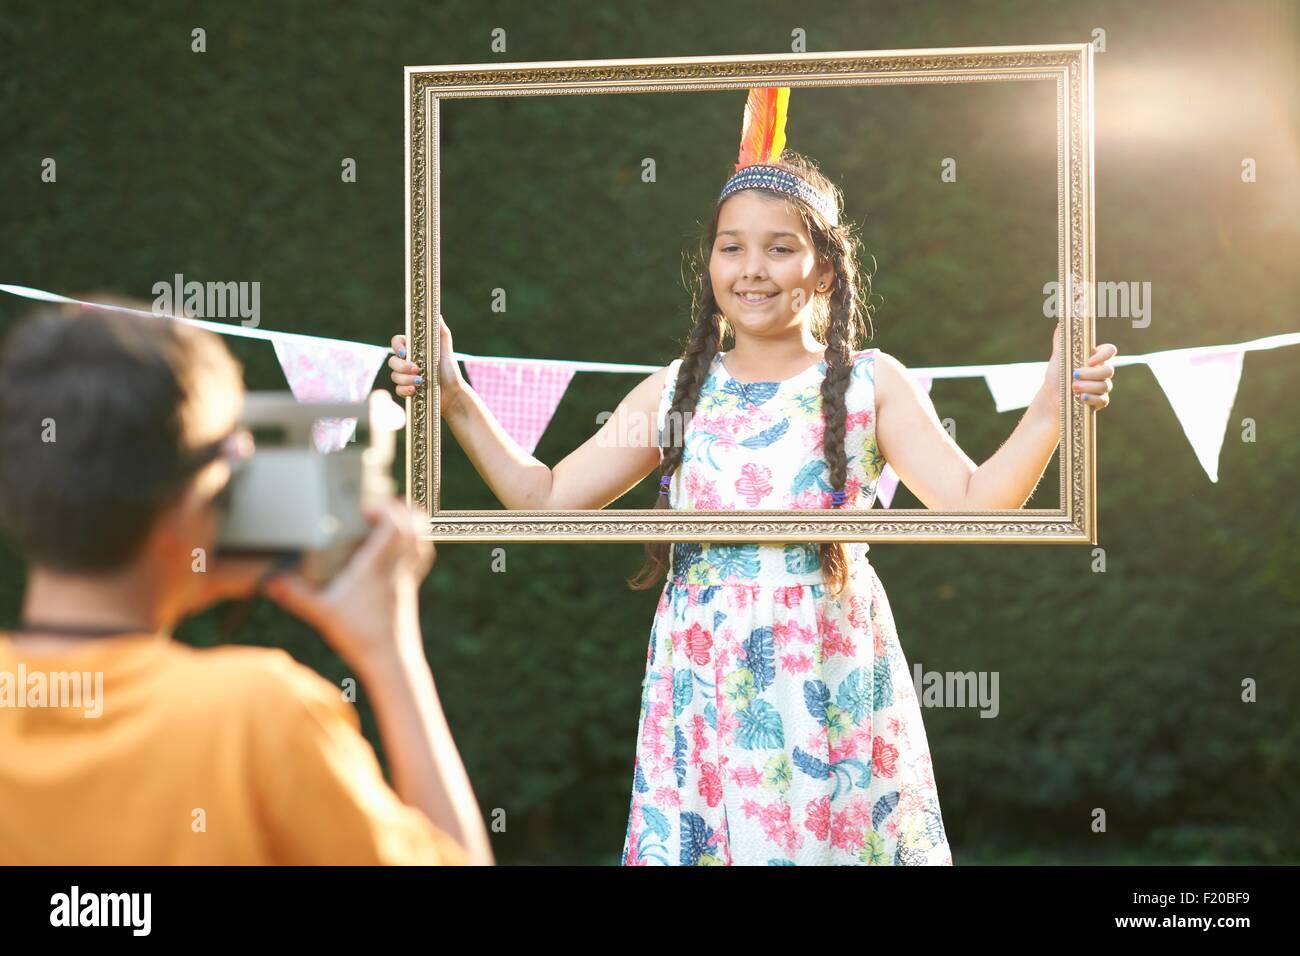 Girl looking through picture frame, having photograph taken - Stock Image